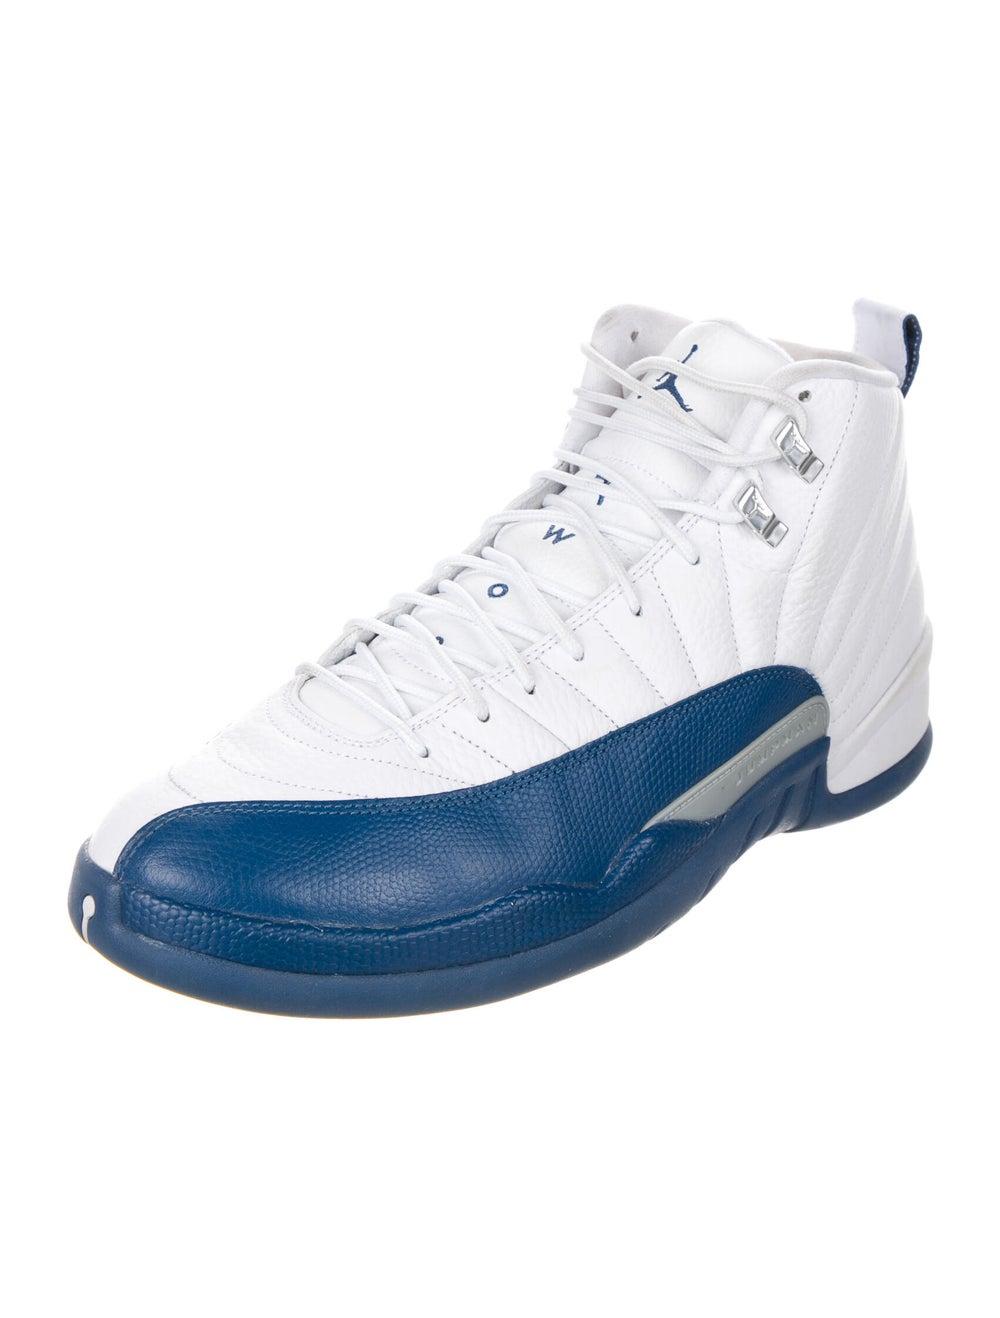 Jordan Jordan 12 Retro French Blue Sneakers Blue - image 2